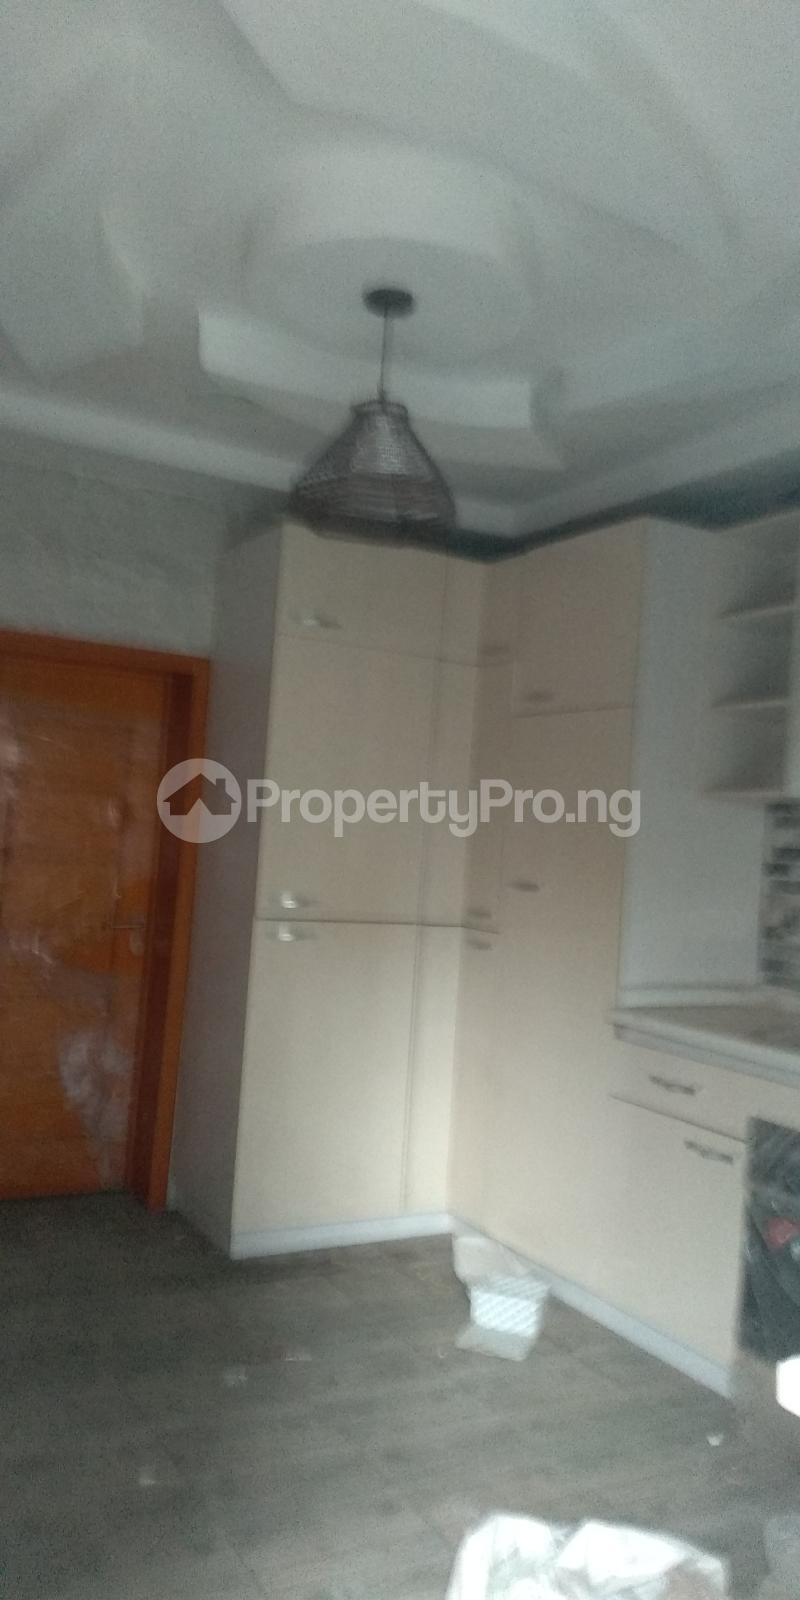 5 bedroom Land for sale Bashiru shittu street magodo shangisha Magodo GRA Phase 2 Kosofe/Ikosi Lagos - 16